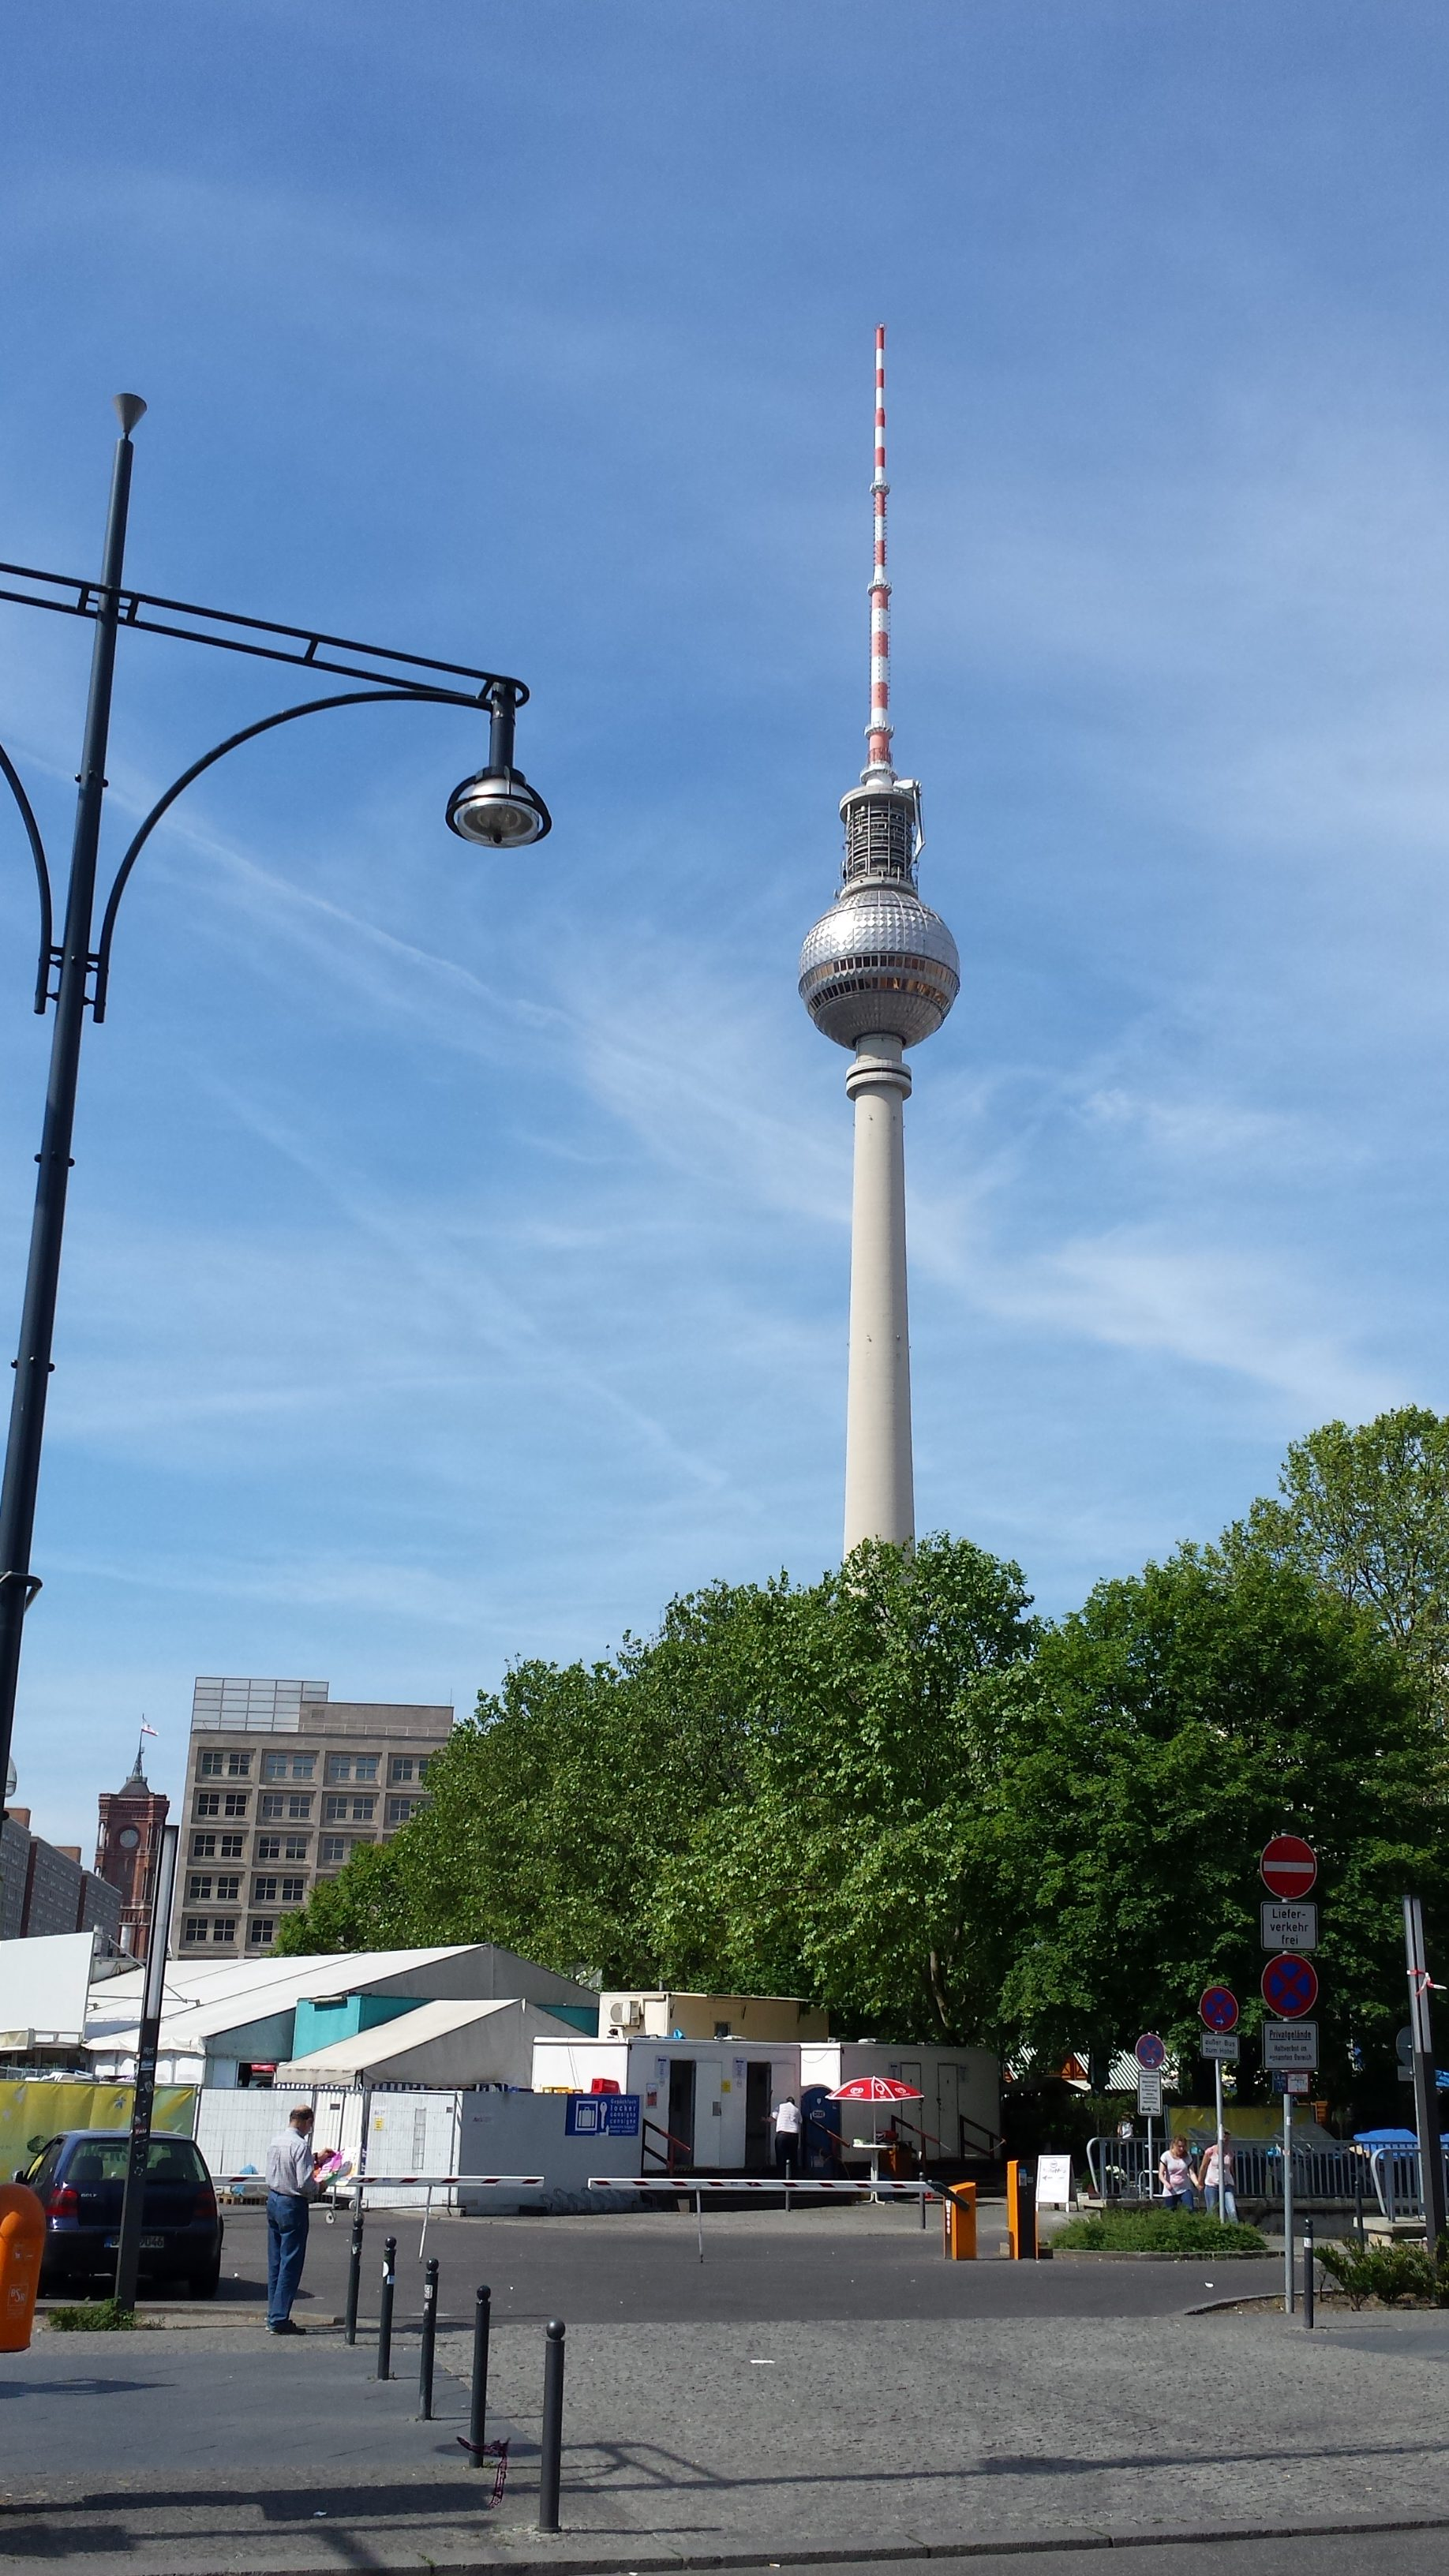 Impressionen aus Berlin, Tag 2